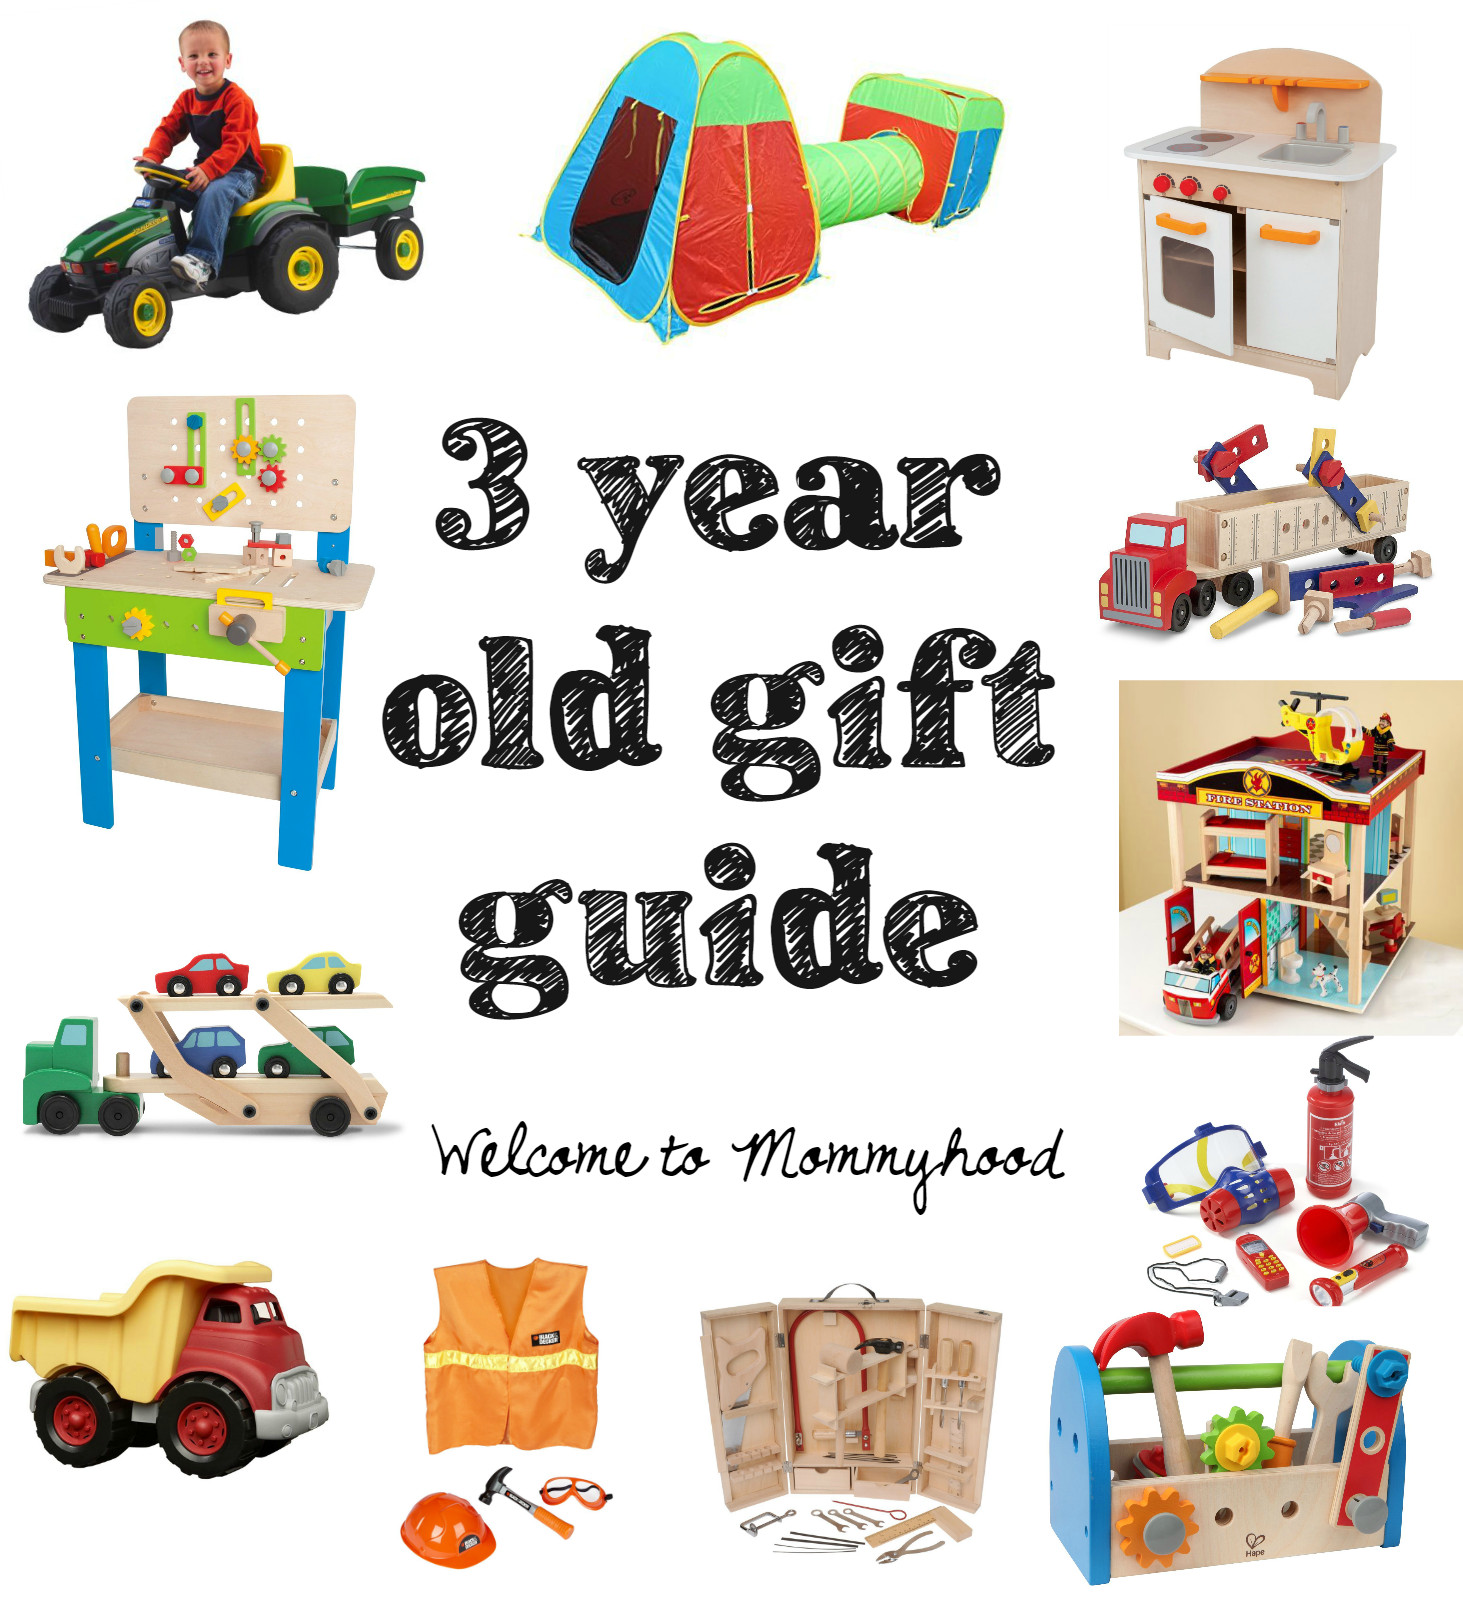 3 Yr Old Birthday Gift Ideas Boys  Birthday t ideas for a 3 year old Wel e to Mommyhood